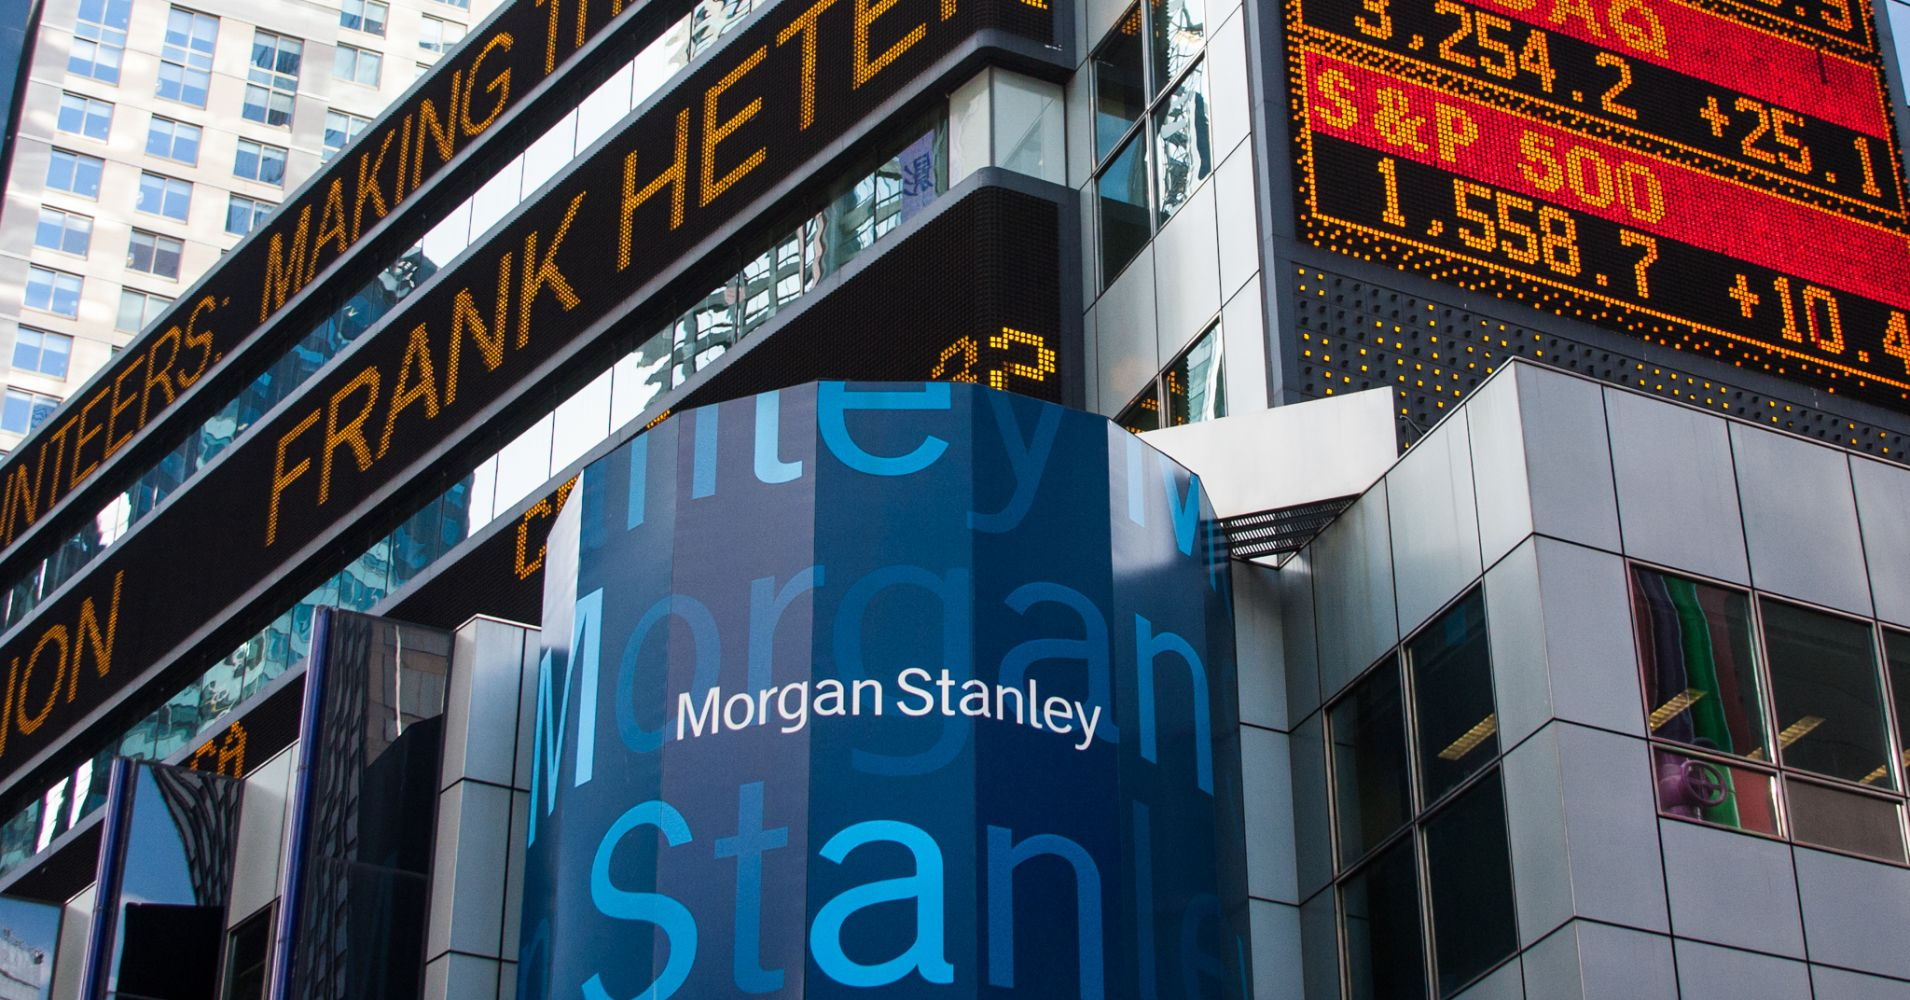 Morgan Stanley launches new advisory technology platform